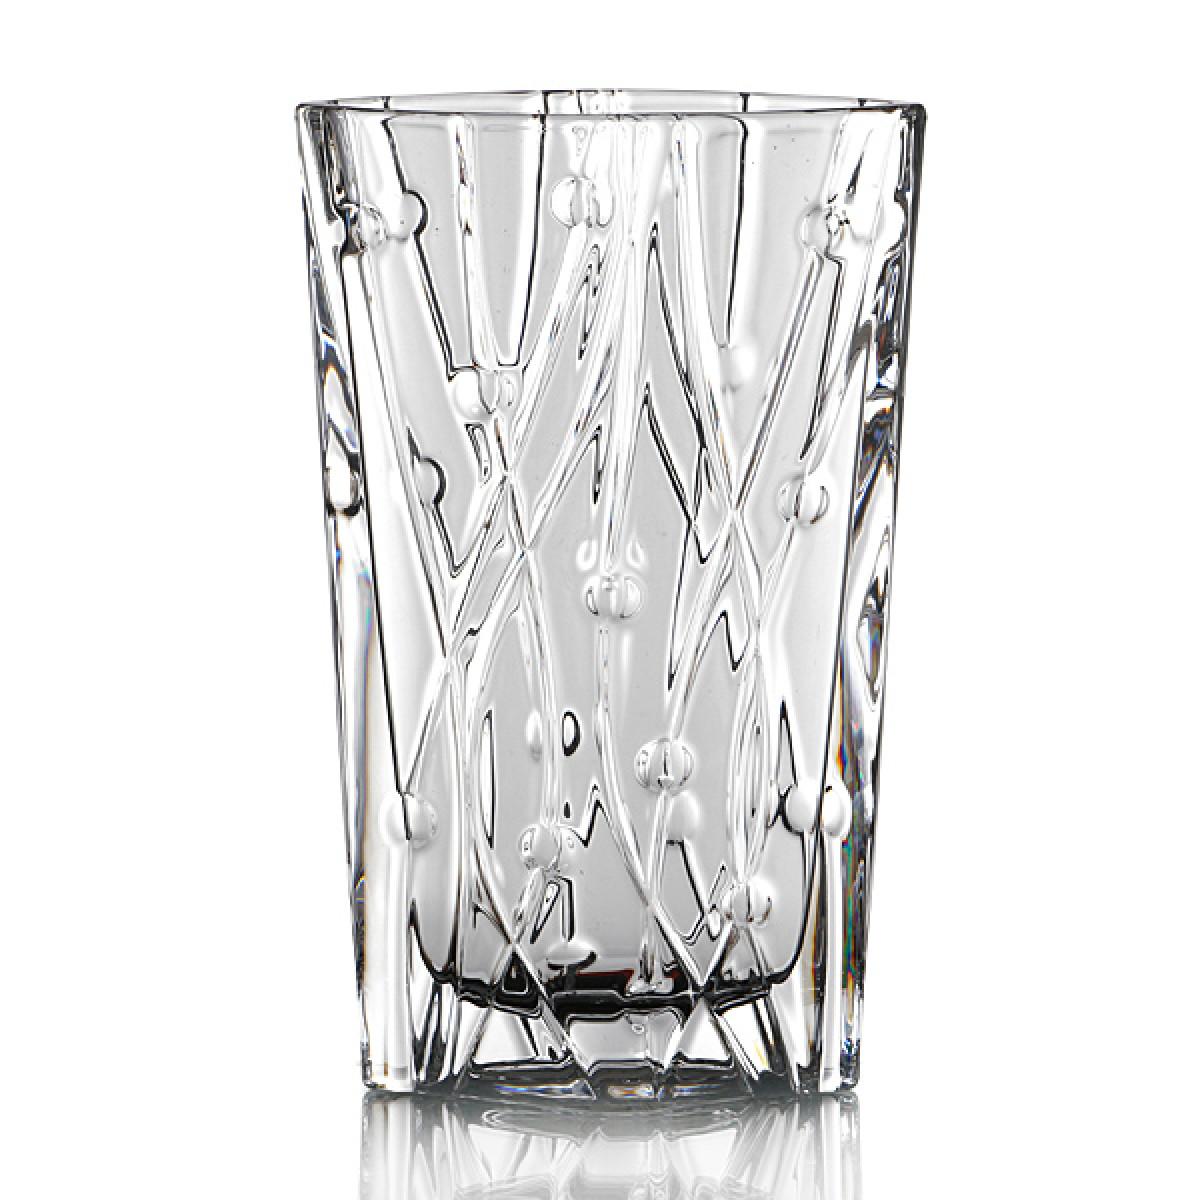 {} Crystalite Bohemia Ваза Steffie (31 см) ваза русские подарки винтаж высота 31 см 123710